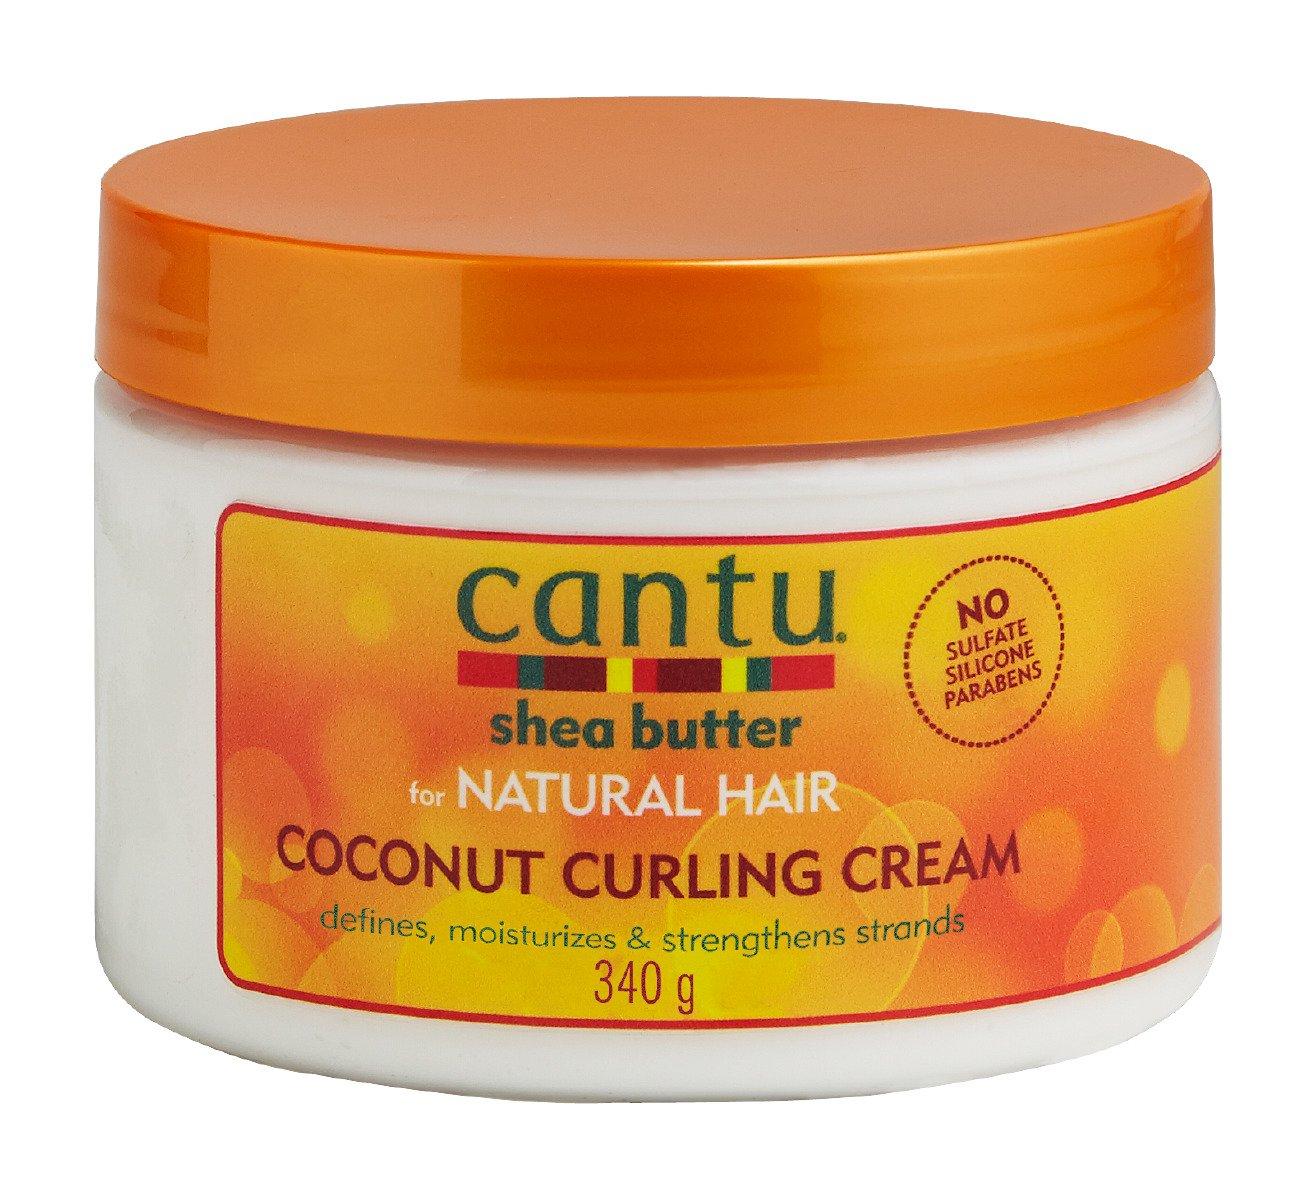 Cantu Coconut Curling Cream, 12 Ounce Dr. Teals MD-FX51-5XNN